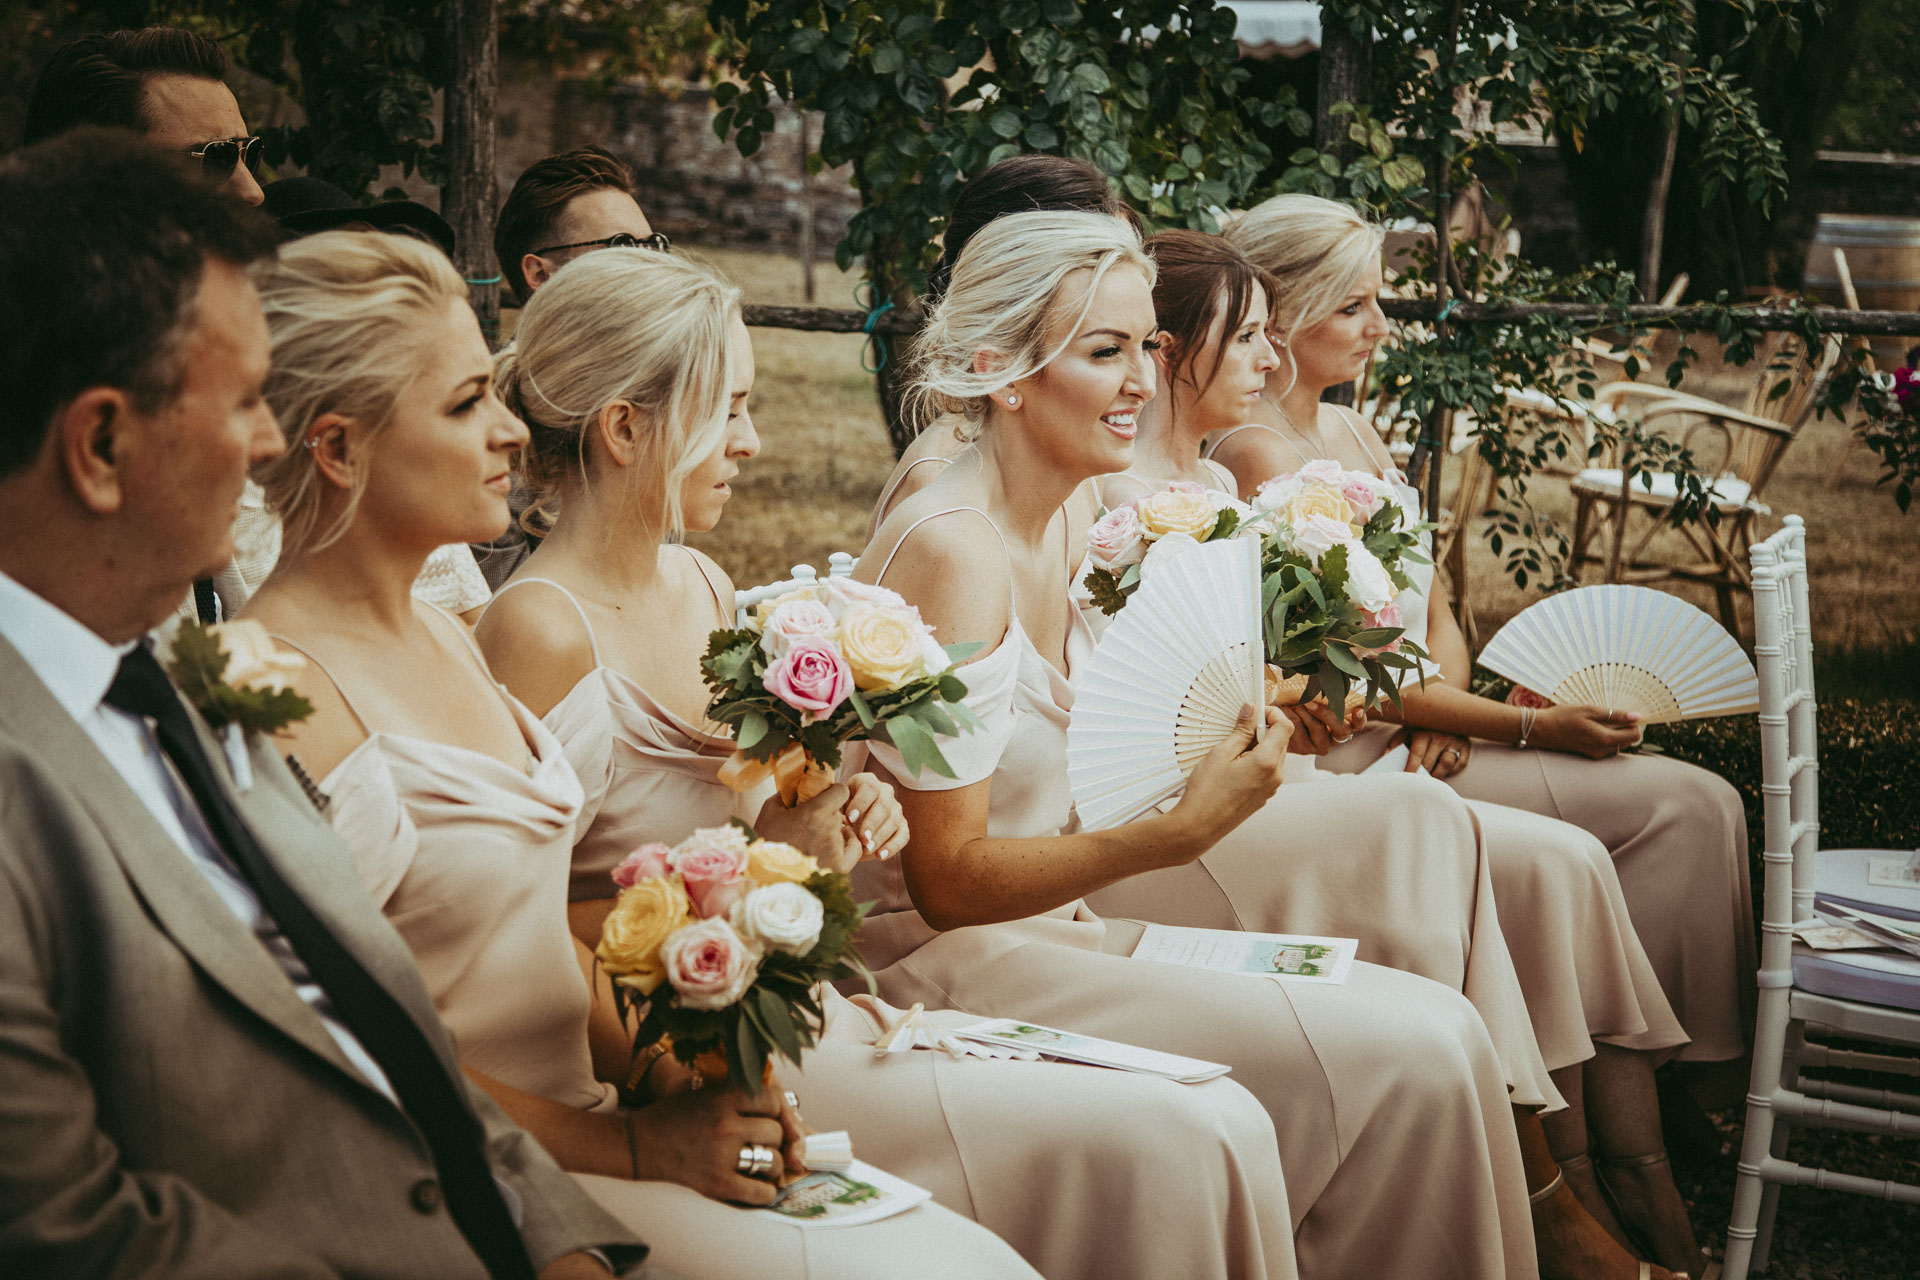 Brides Witness